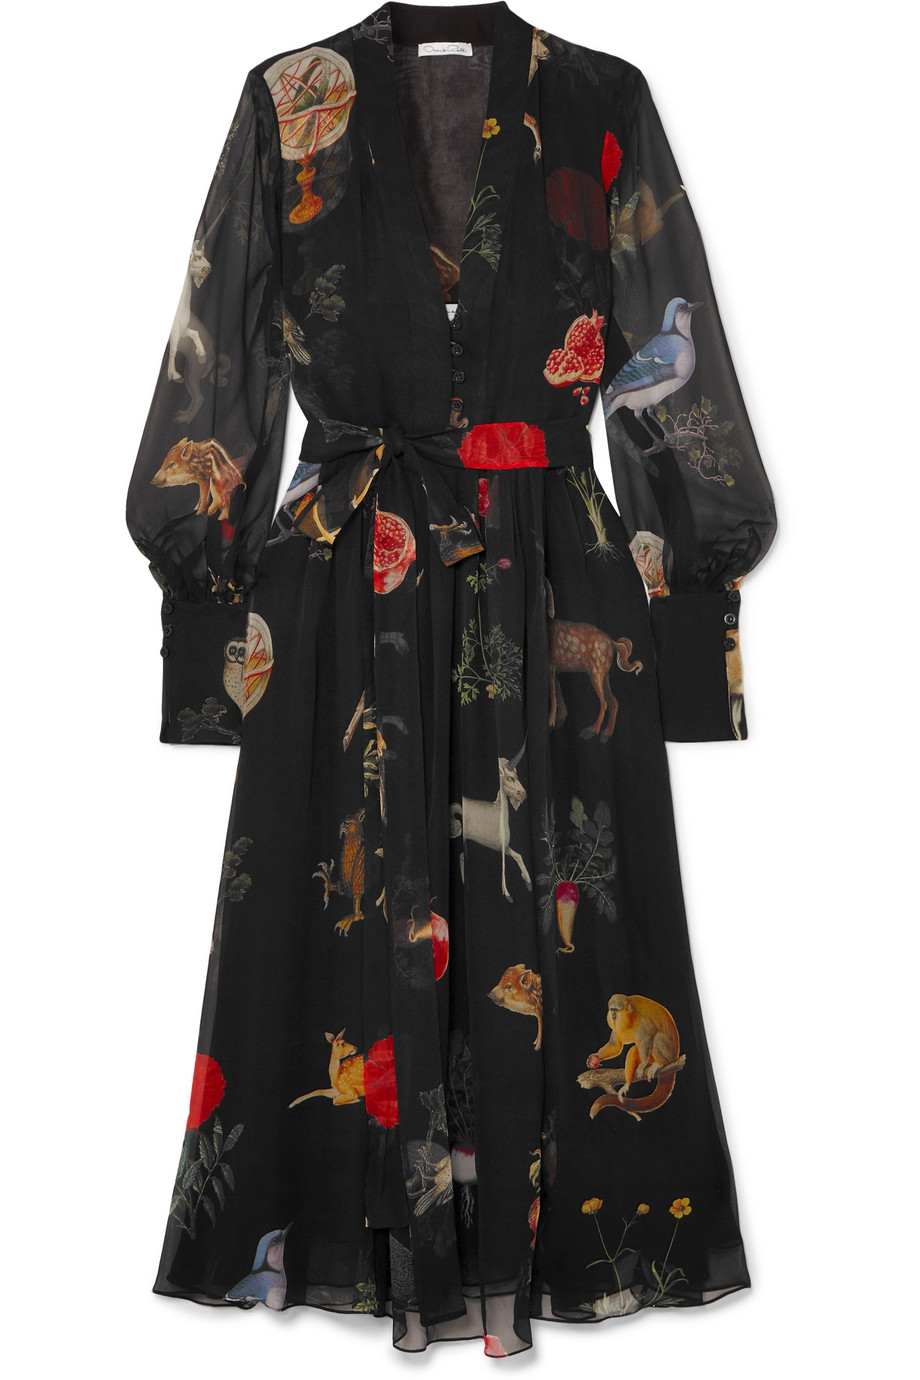 Oscar de la Renta Chiffon Dress Meghan Markle